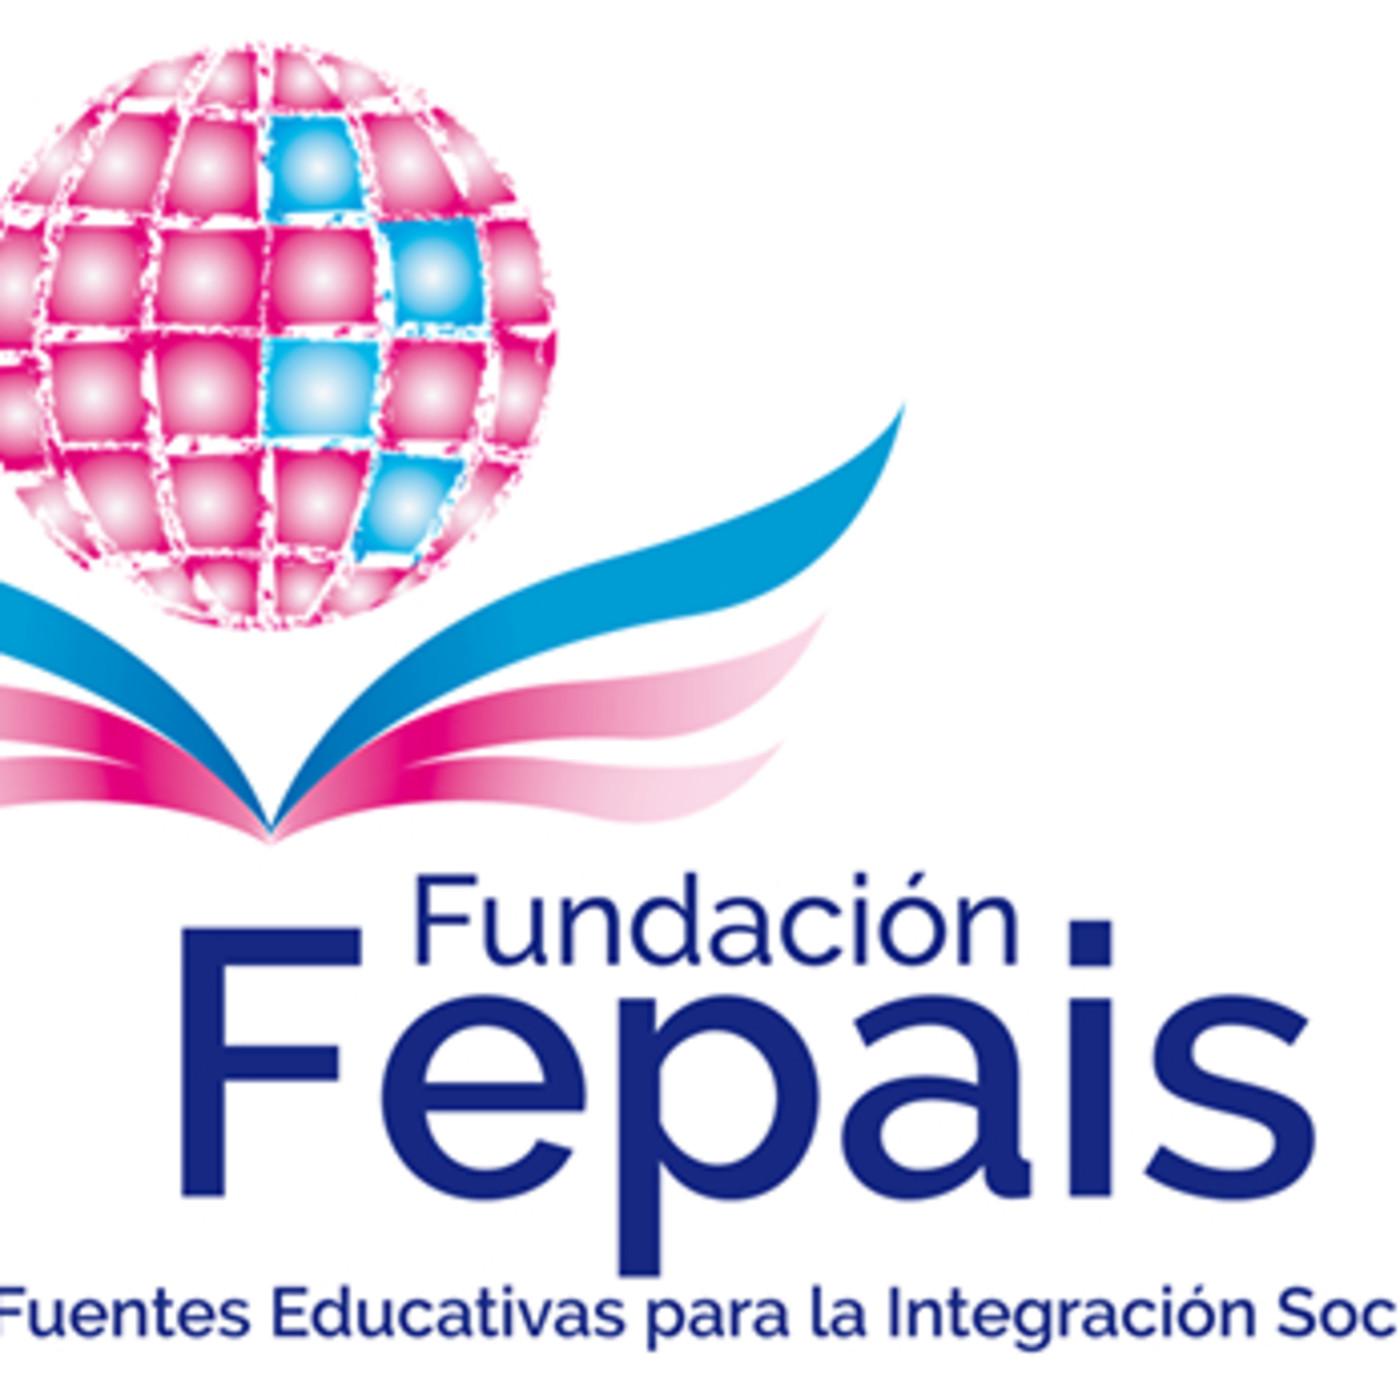 Educaci n para poder carla tonella directora ejecutiva for Educacion para poder